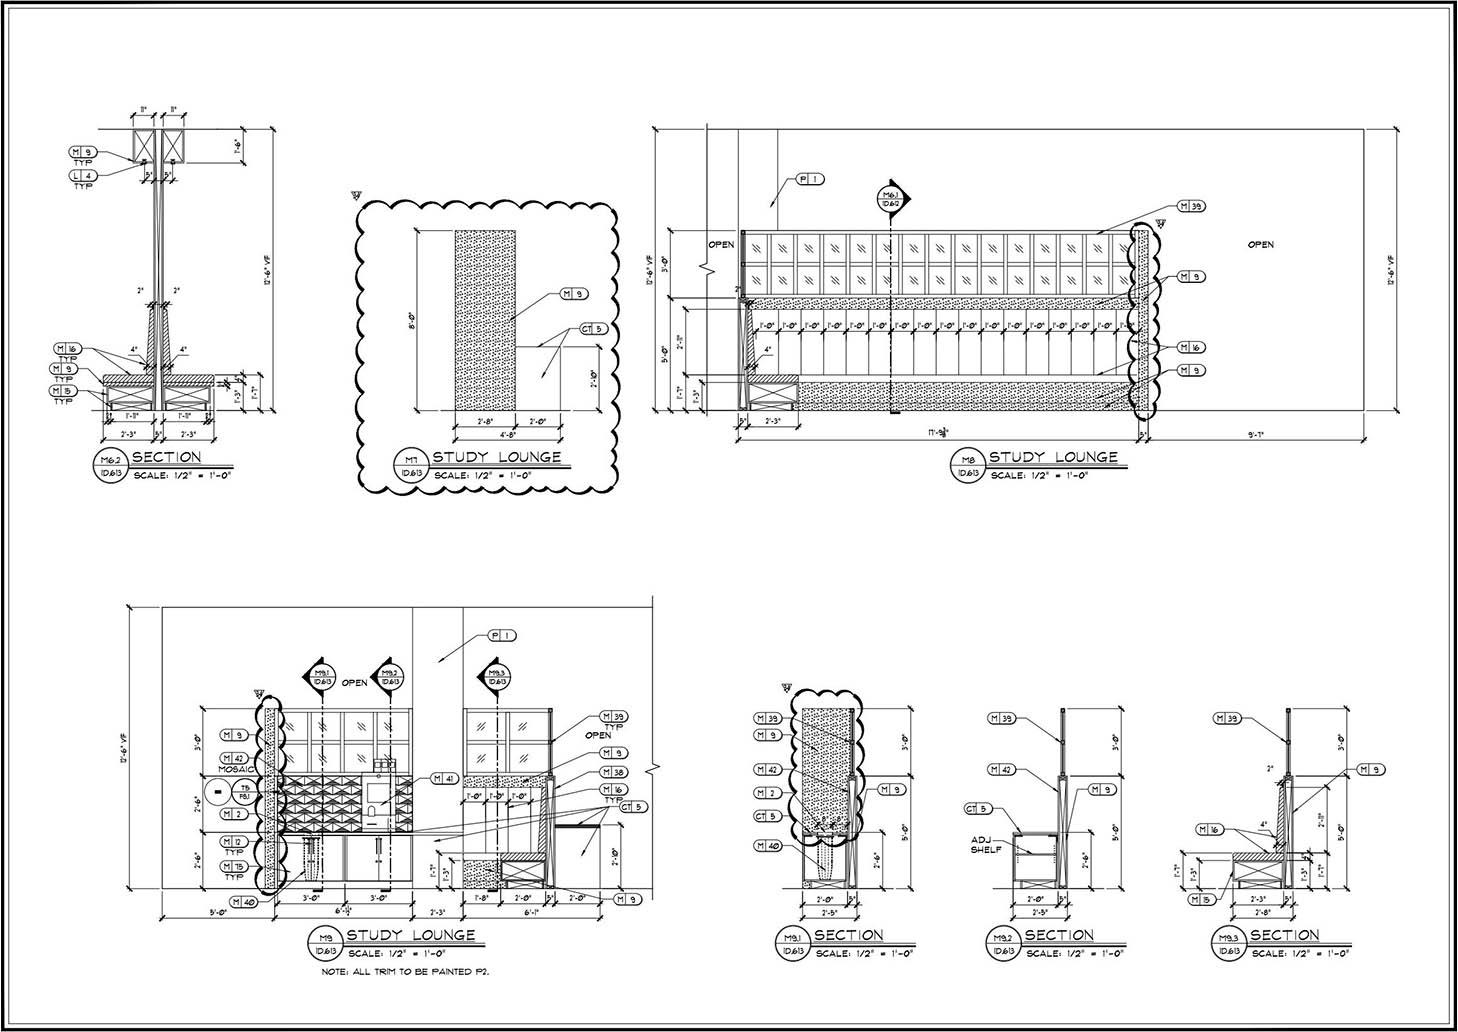 ID elevation drawings